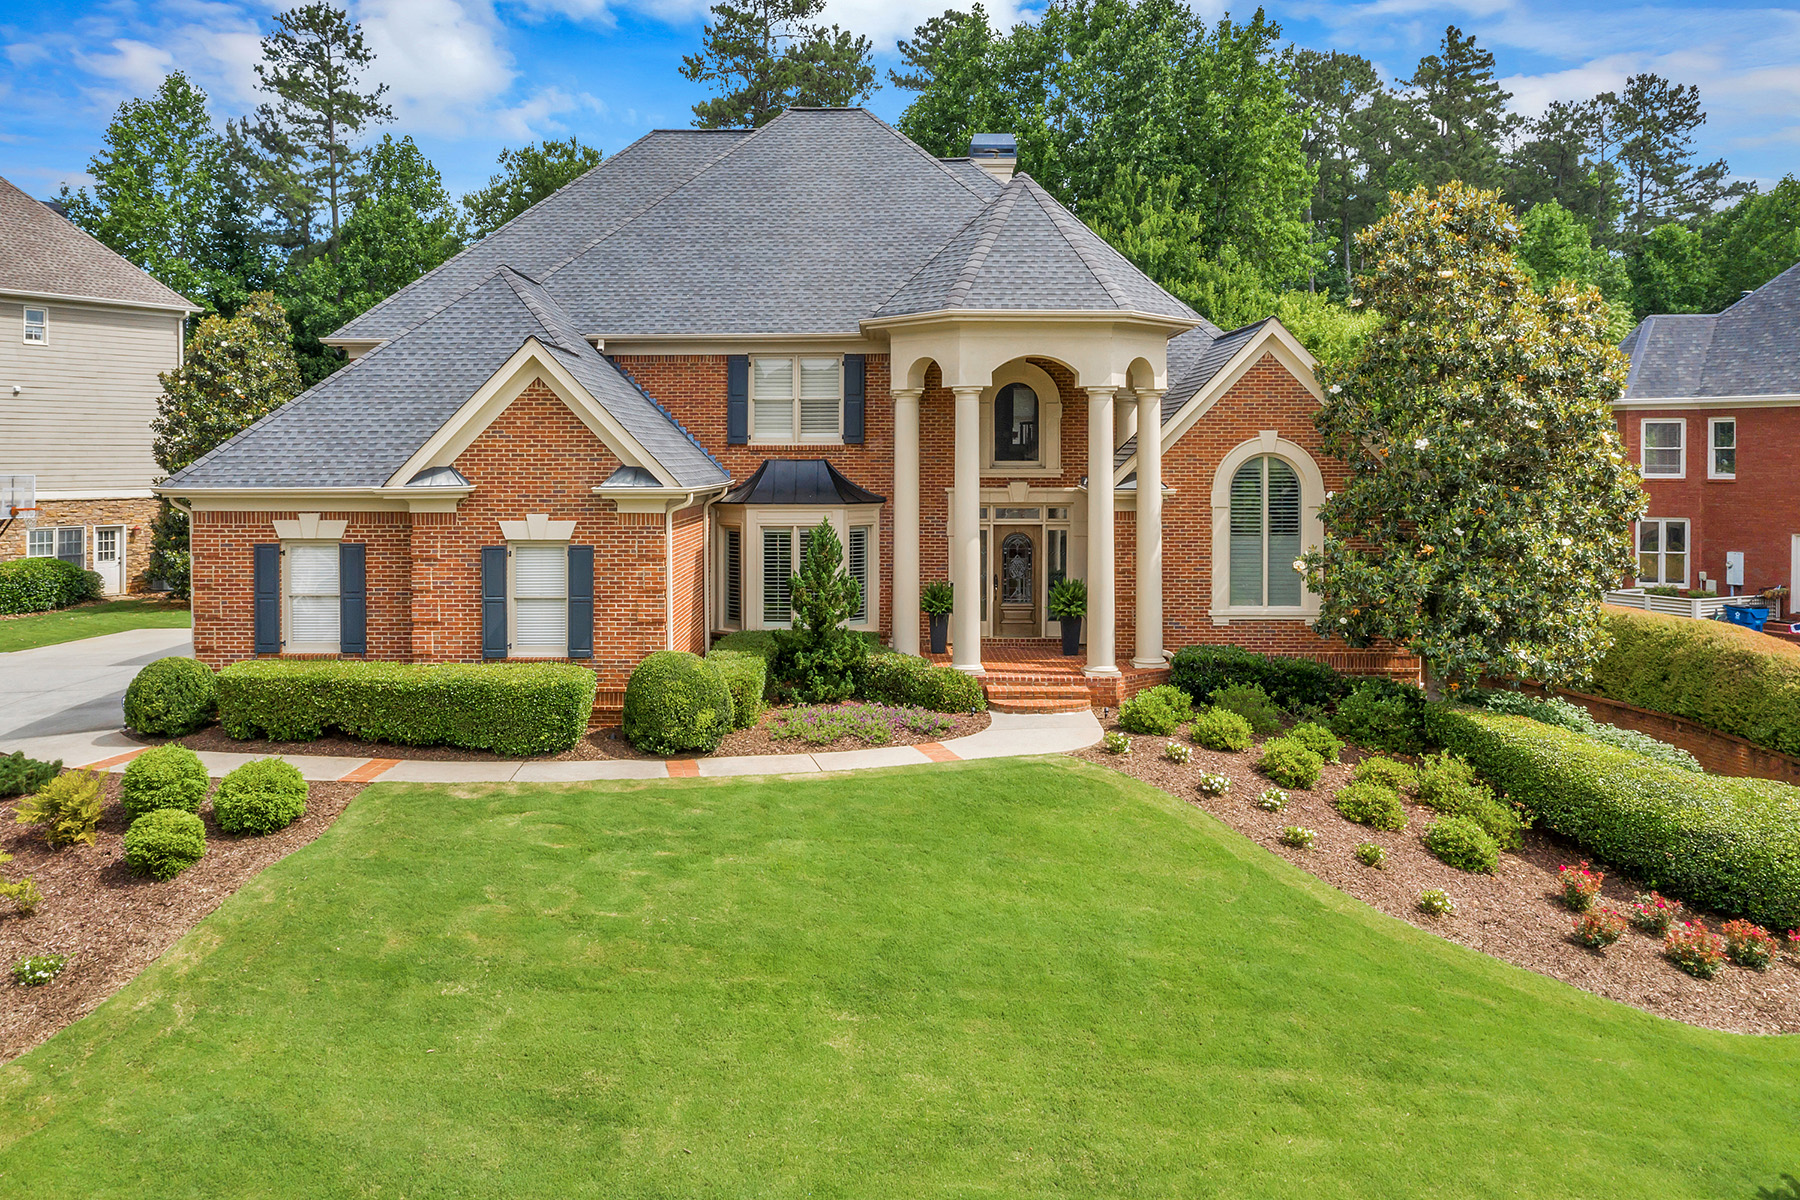 Single Family Homes для того Продажа на Stunning Windward Home With Resort-Style Outdoor Living 2205 Lake Shore Landing, Alpharetta, Джорджия 30005 Соединенные Штаты